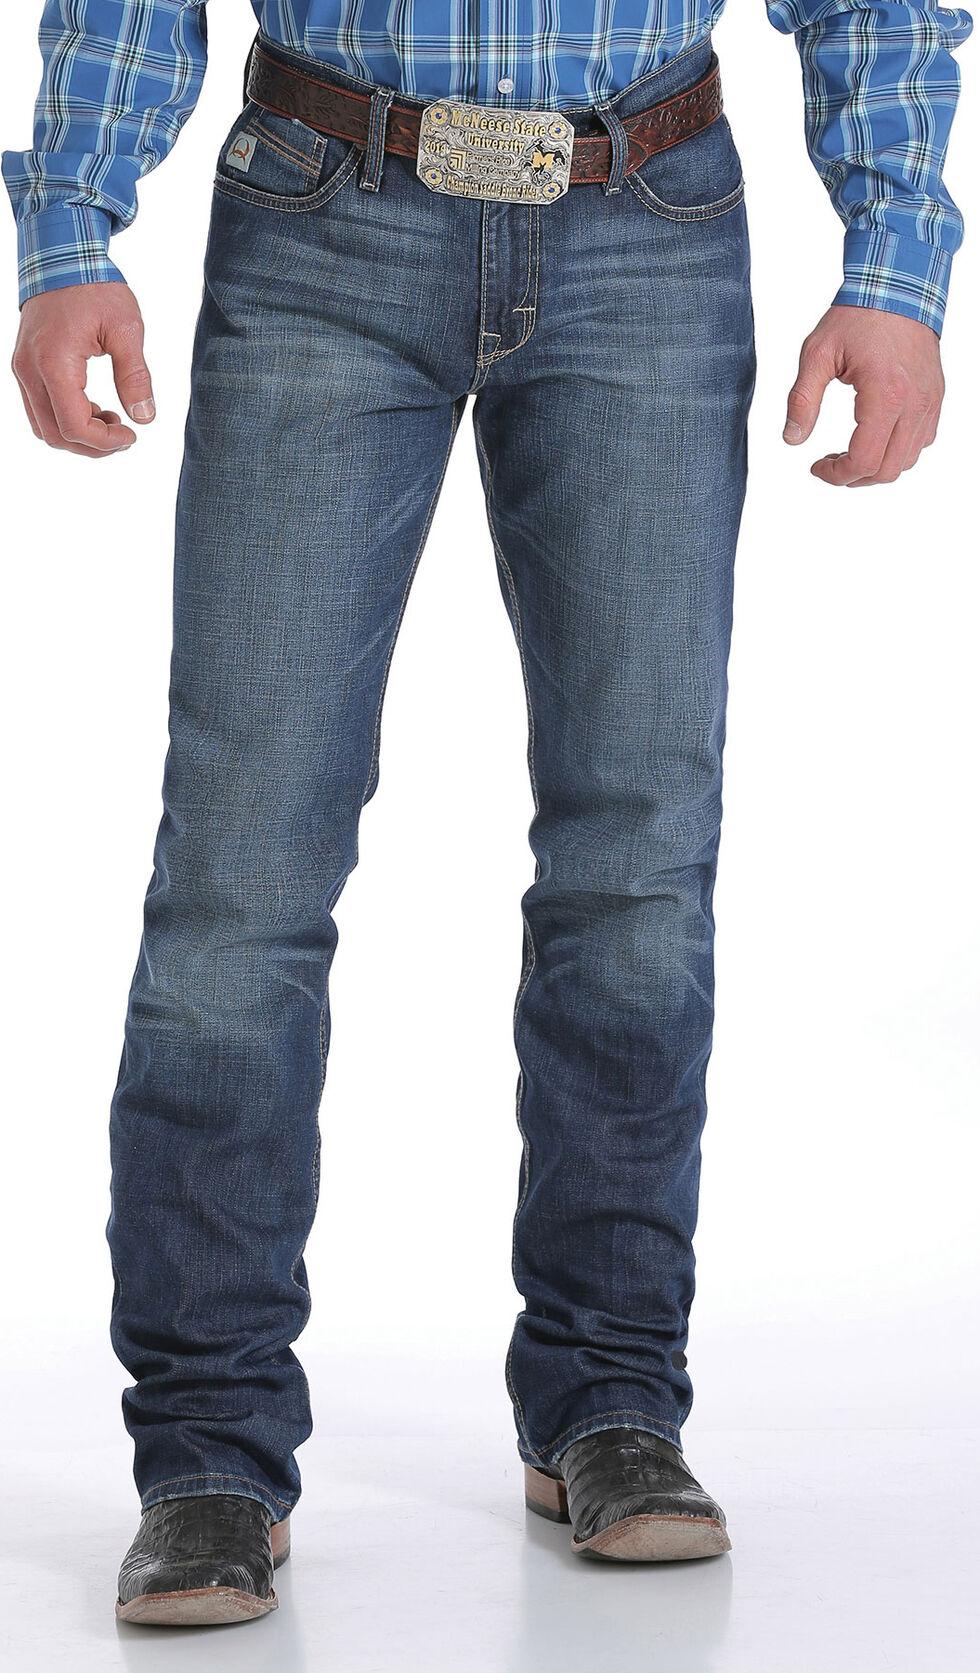 Cinch Men's Ian Performance Mid-Rise Slim Boot Cut Jeans, Indigo, hi-res